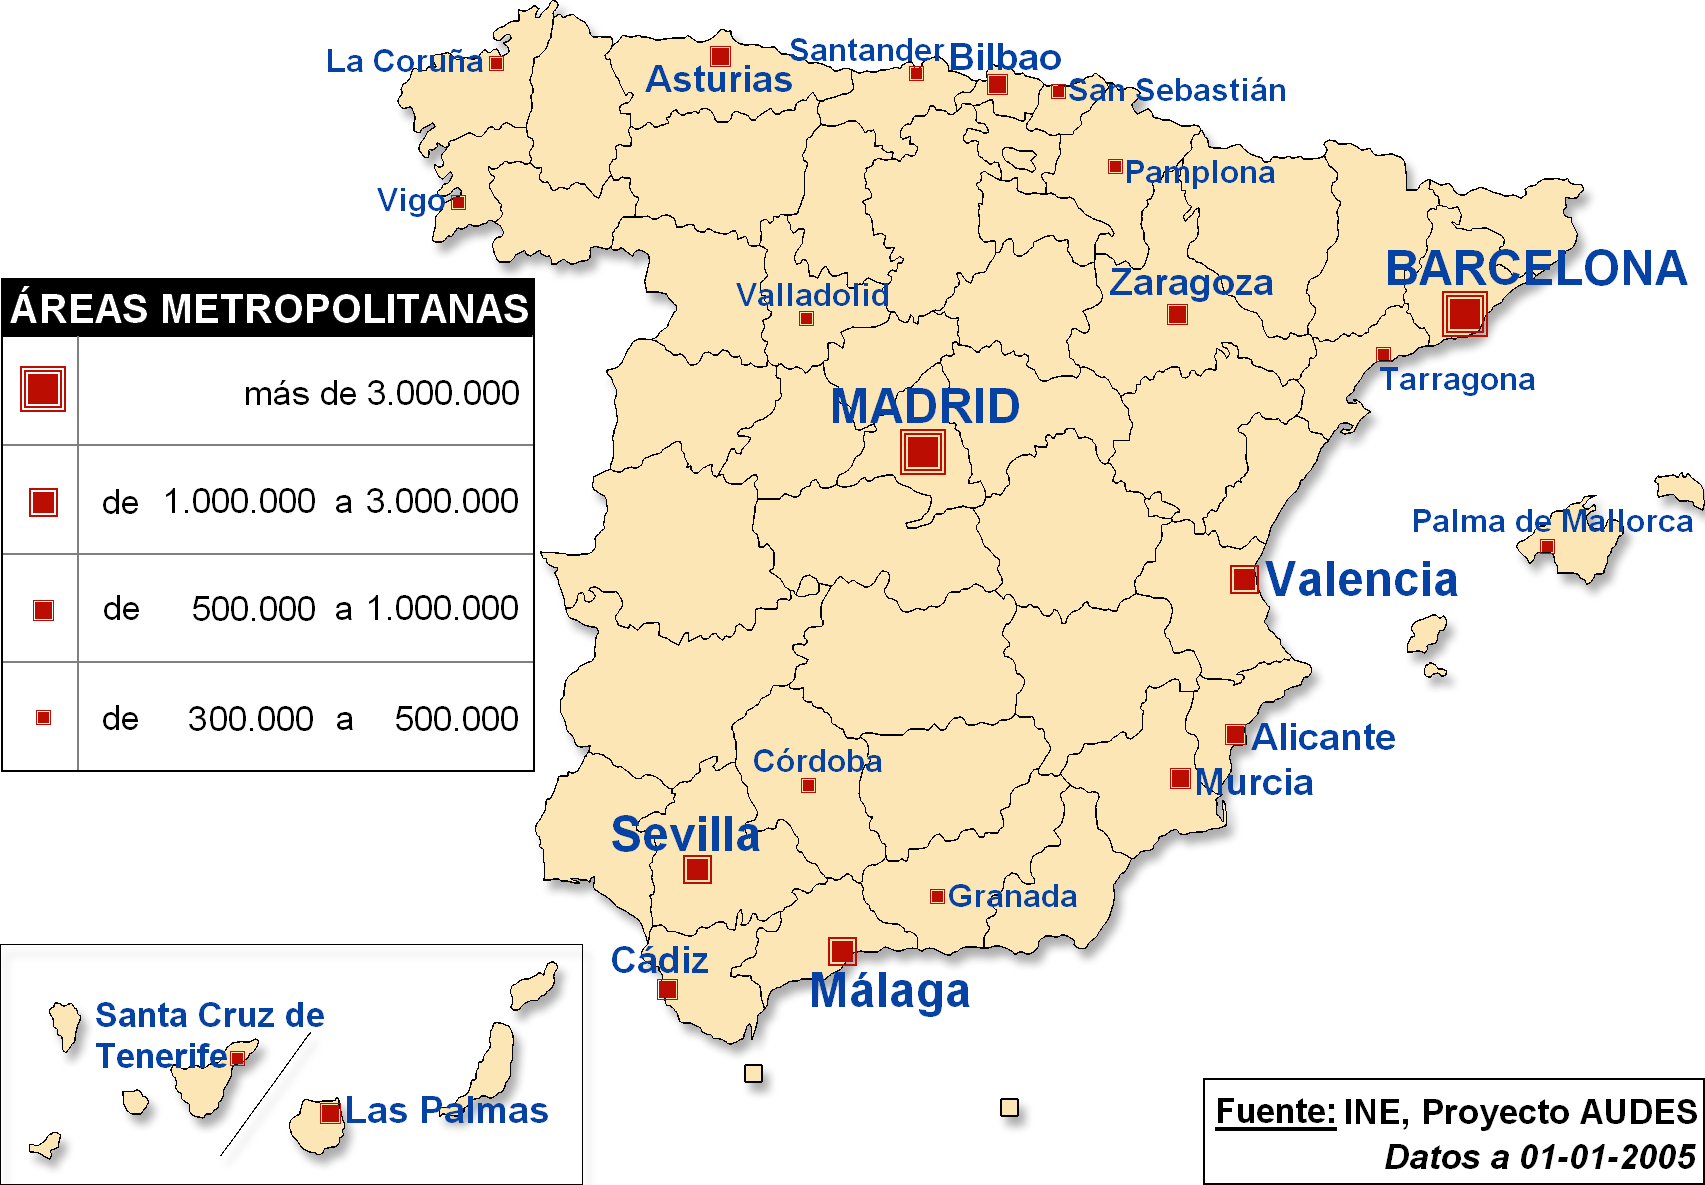 Big Map Of Spain.Spain Big Cities 2005 Map Populationdata Net